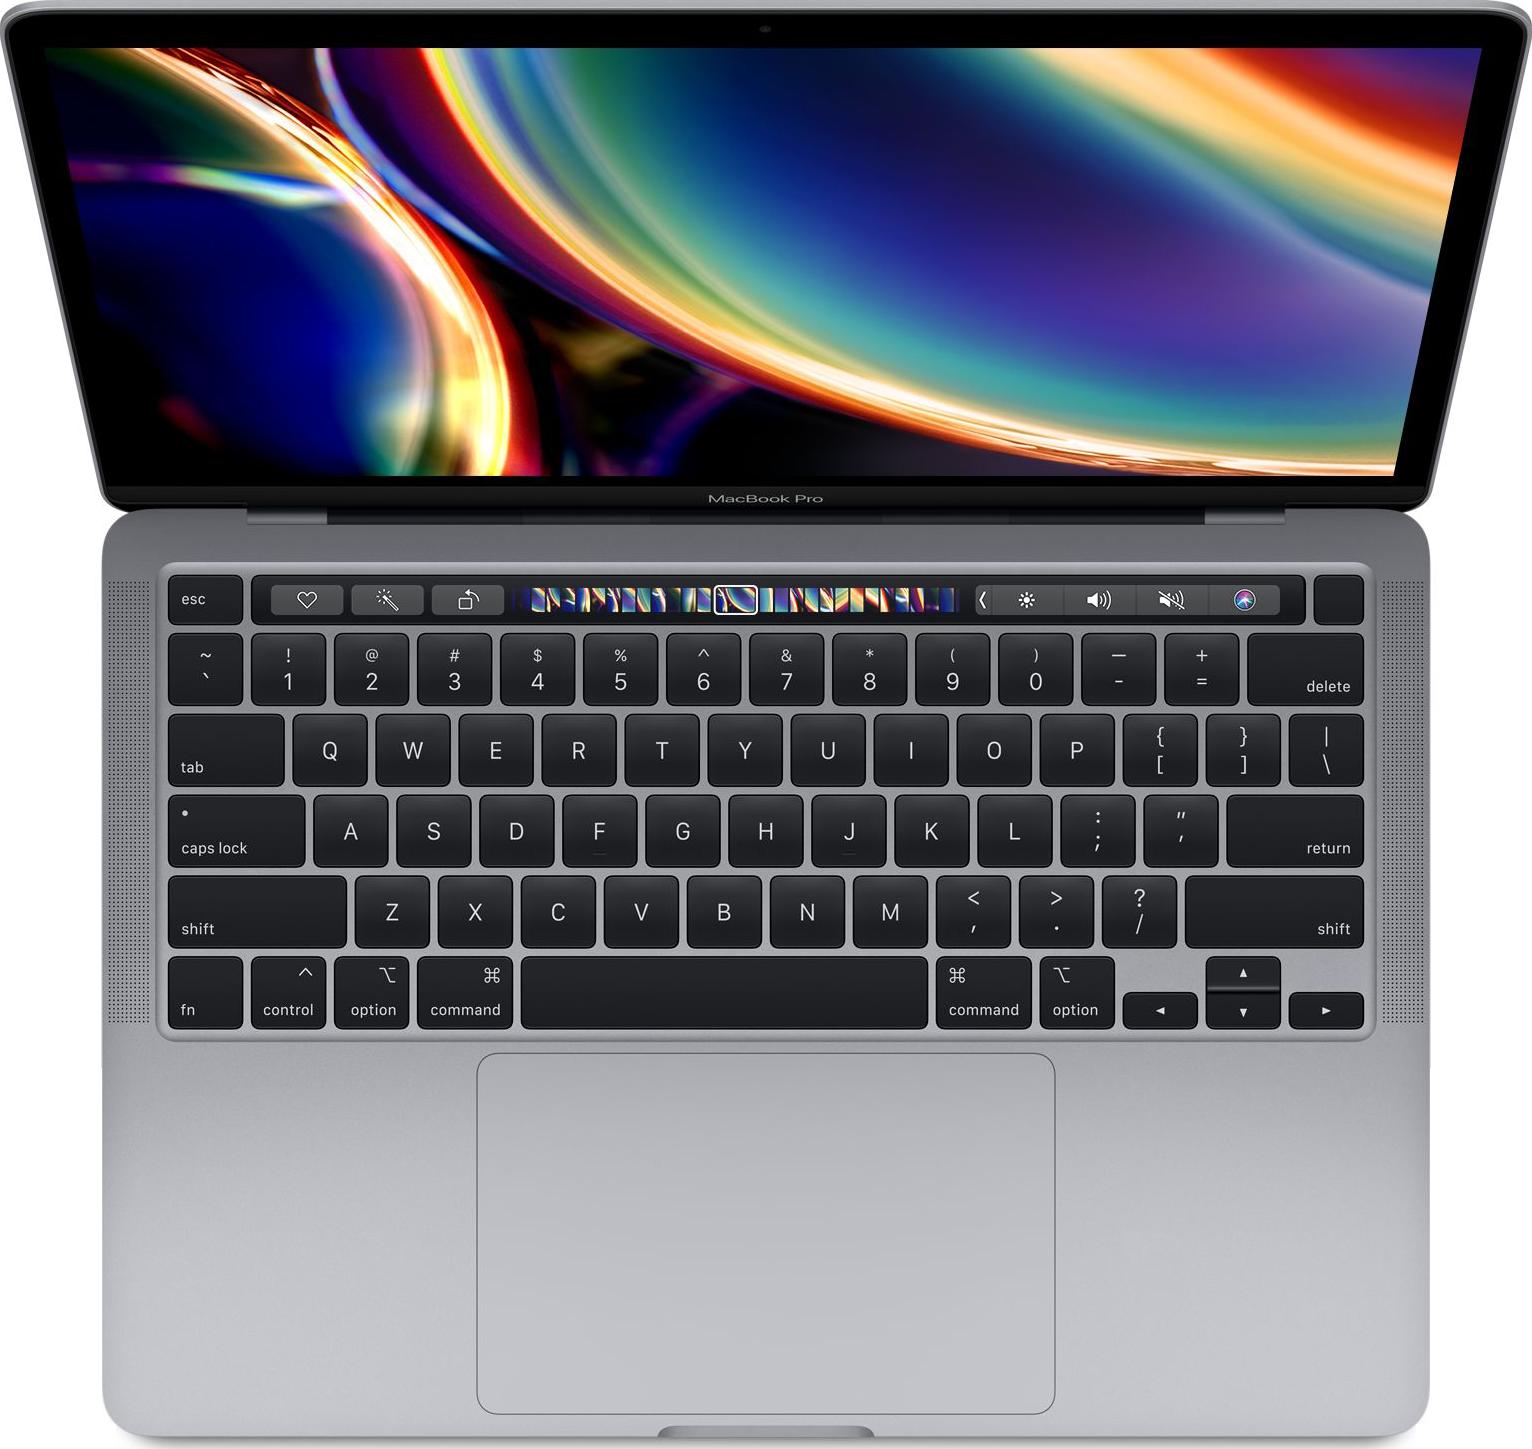 MacBook Pro image.